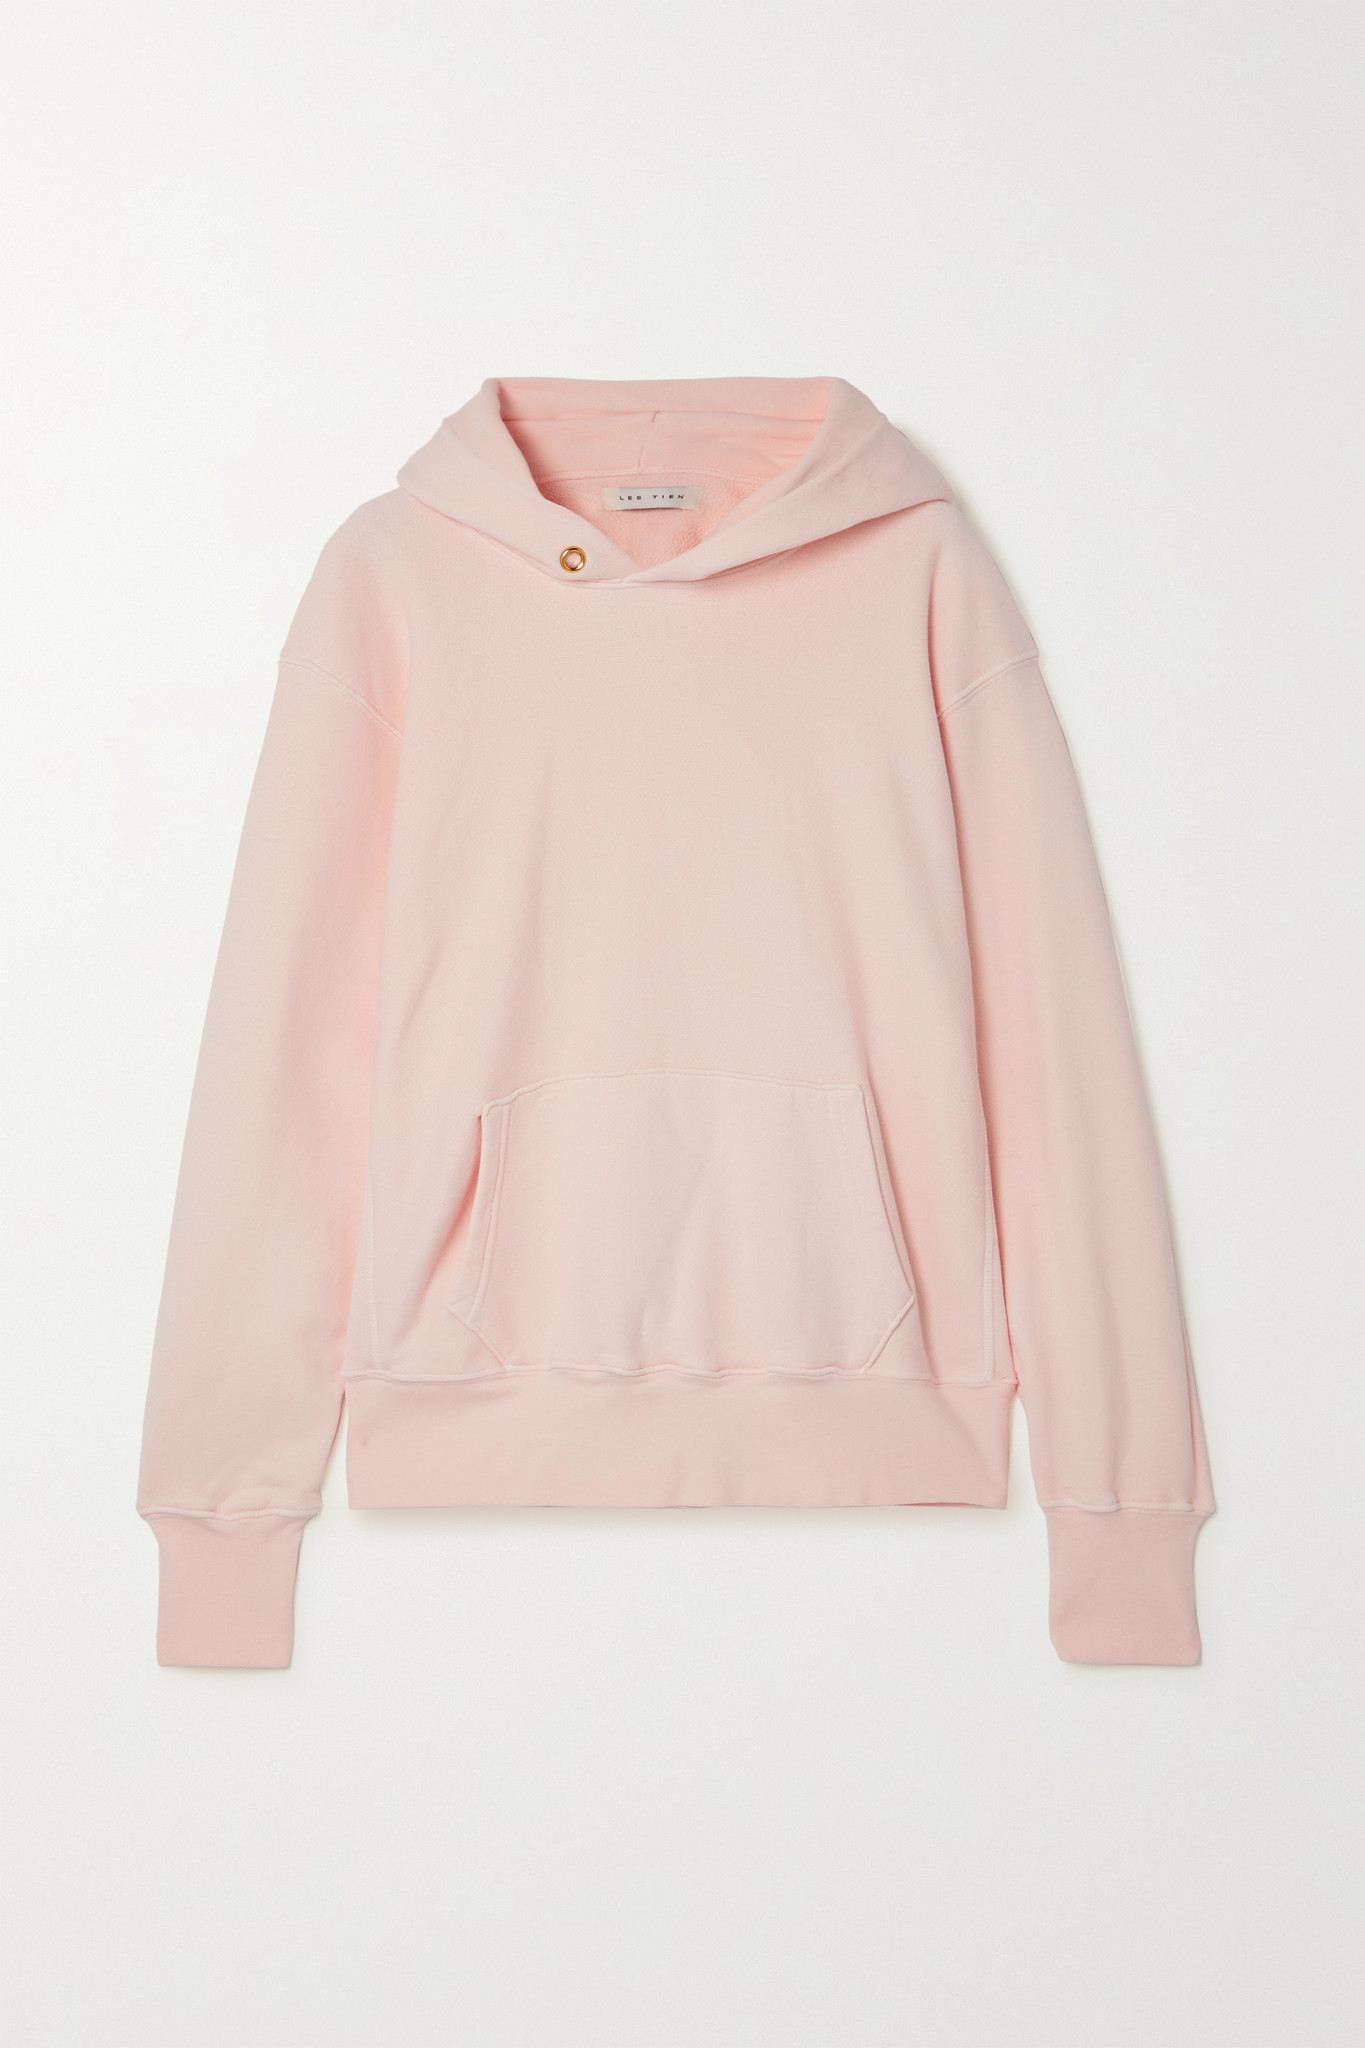 LES TIEN - 纯棉平纹布帽衫 - 粉红色 - x small